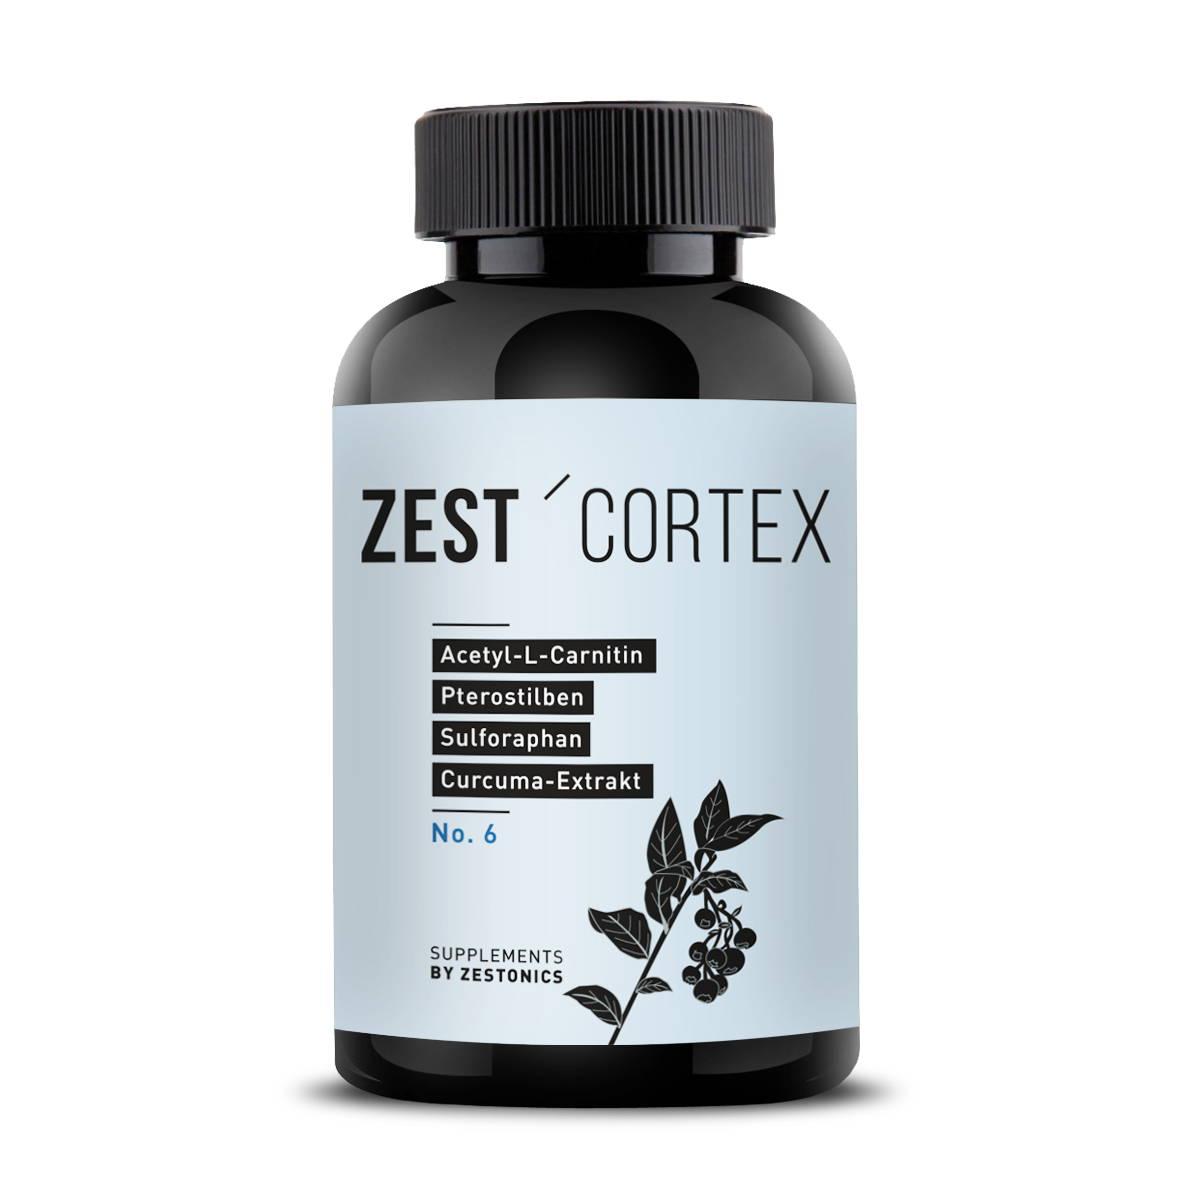 zestonics zestcortex